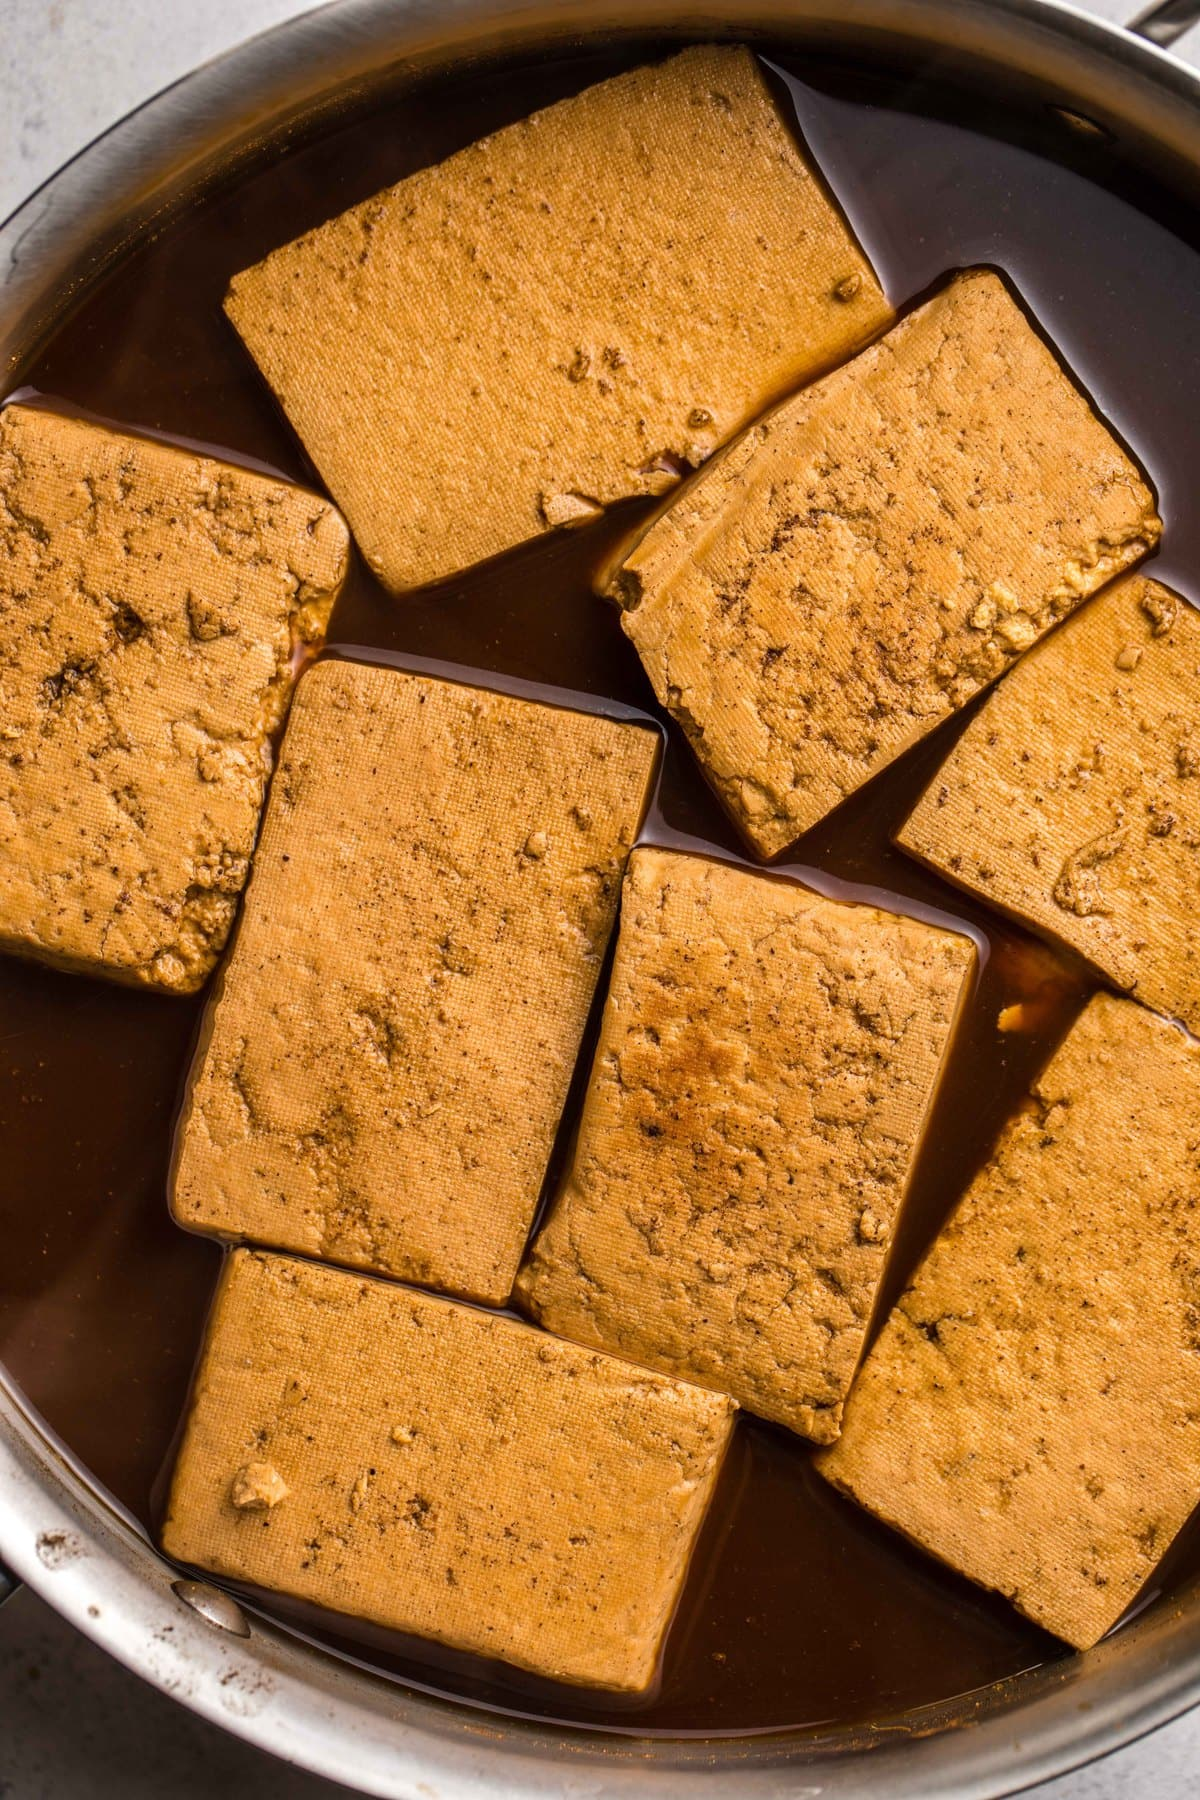 darkened braised tofu after simmering in large metal pot